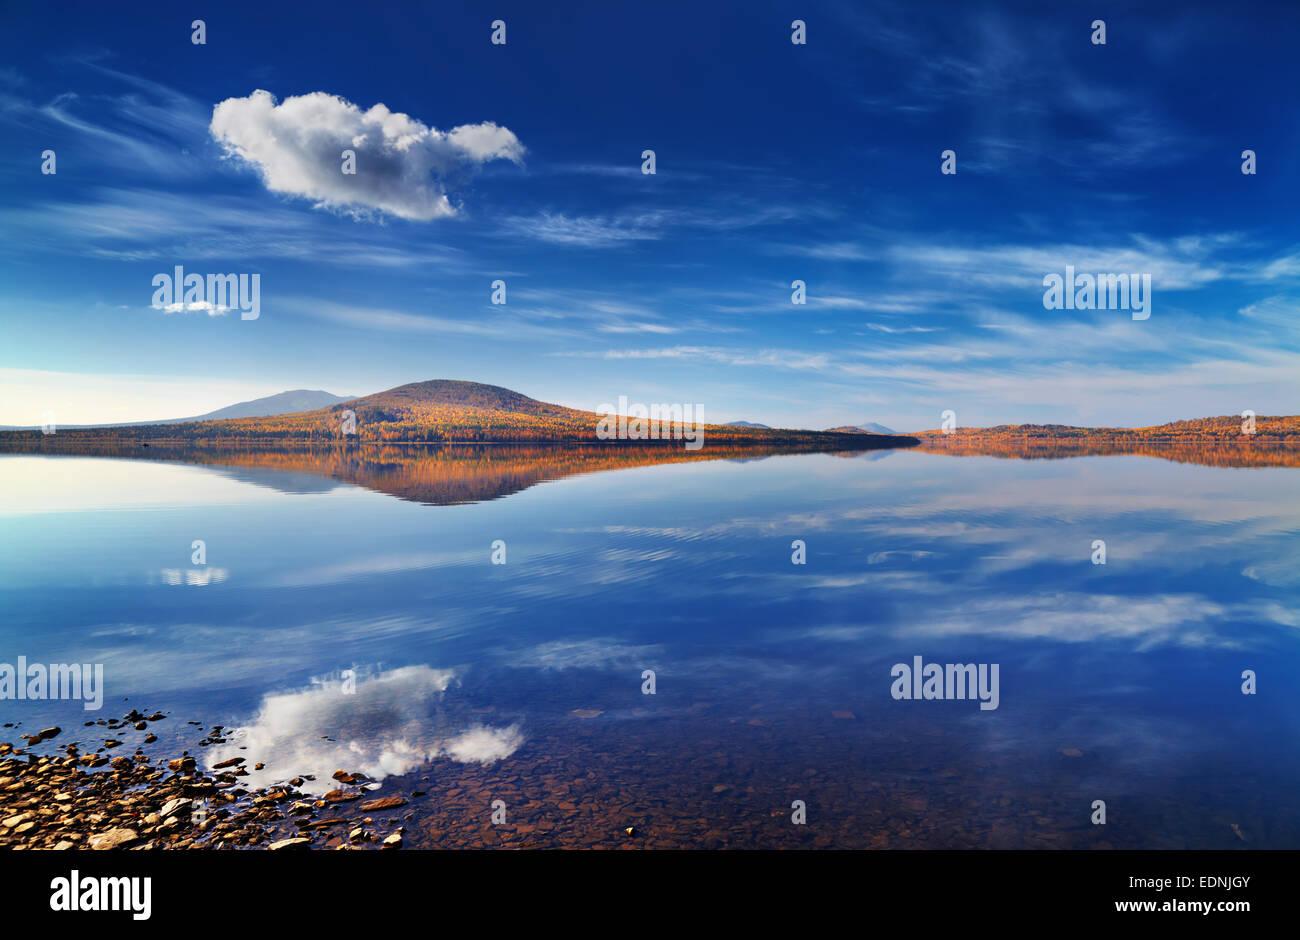 Lago Zuratkul nei monti Urali, Russia Immagini Stock